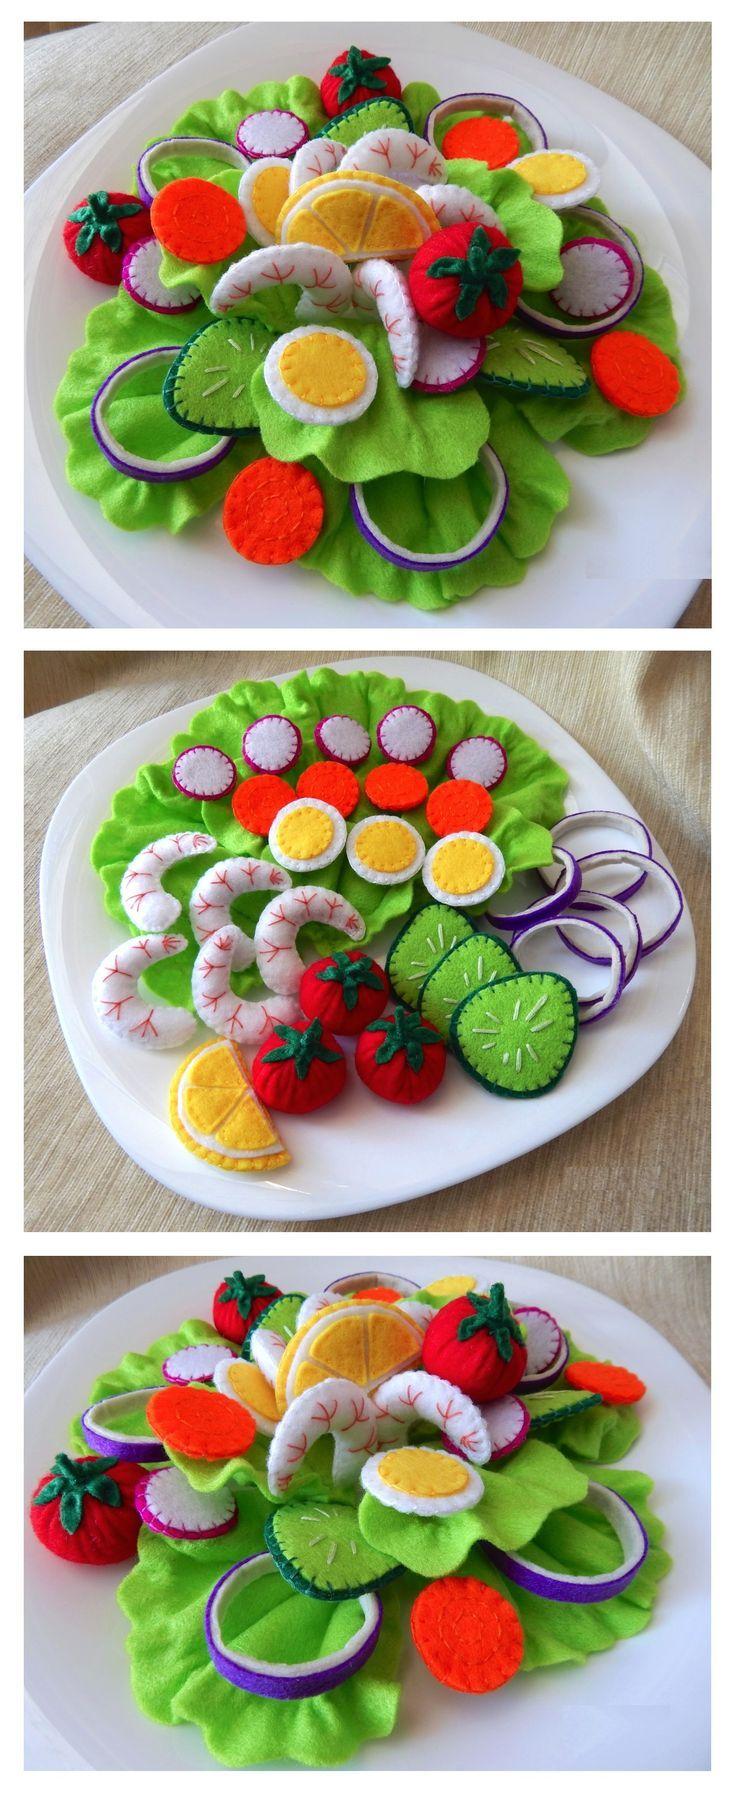 Salad with shrimps of felt. Toy cooking set. play restaurant. Felt salad. Felt vegetables.